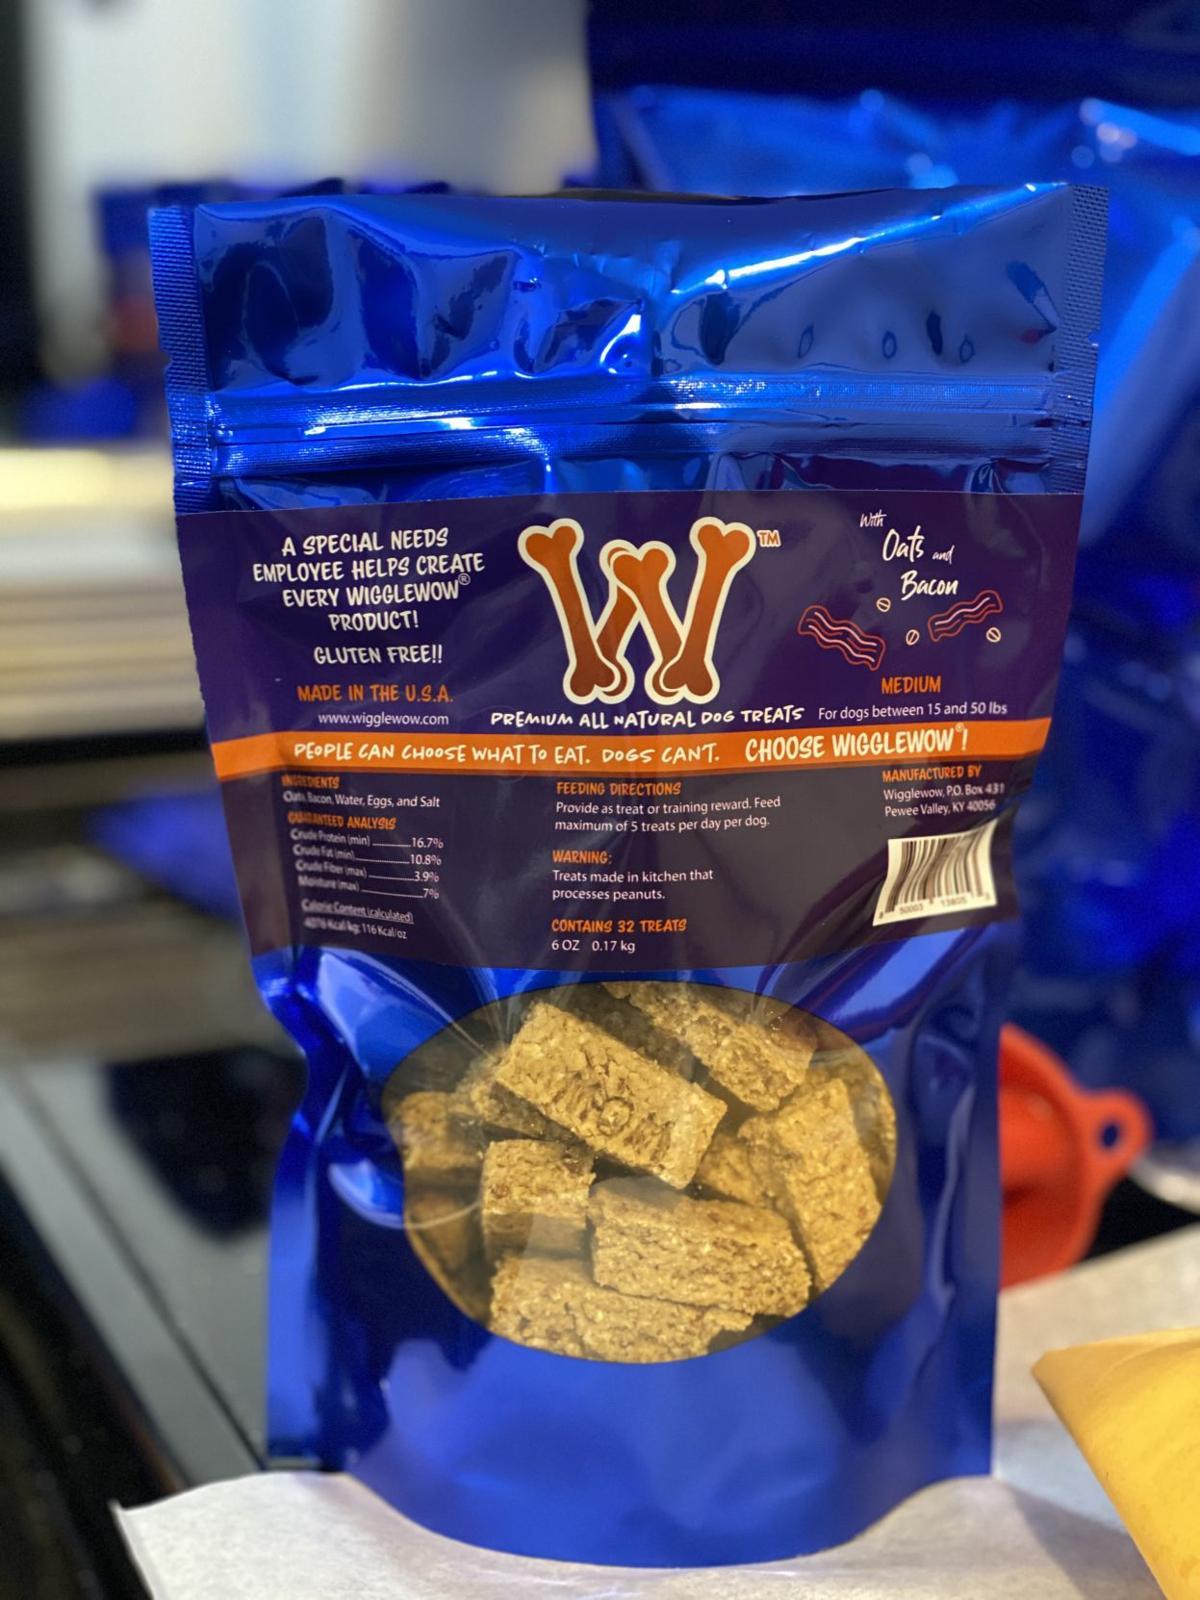 Wigglewow makes homemade dog treats